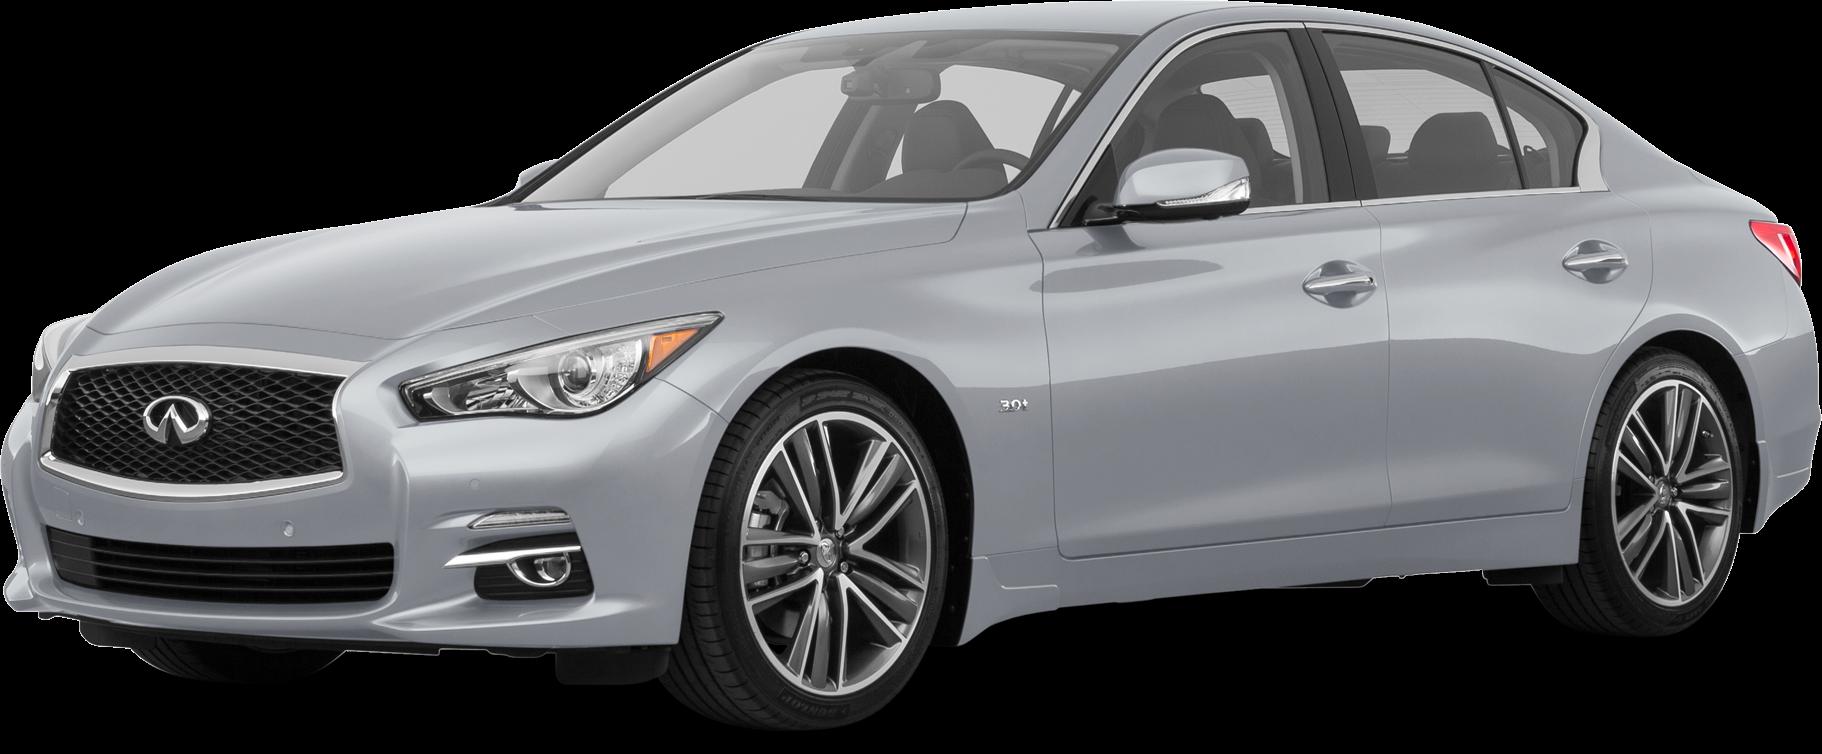 2017 Infiniti Q50 Values Cars For Sale Kelley Blue Book